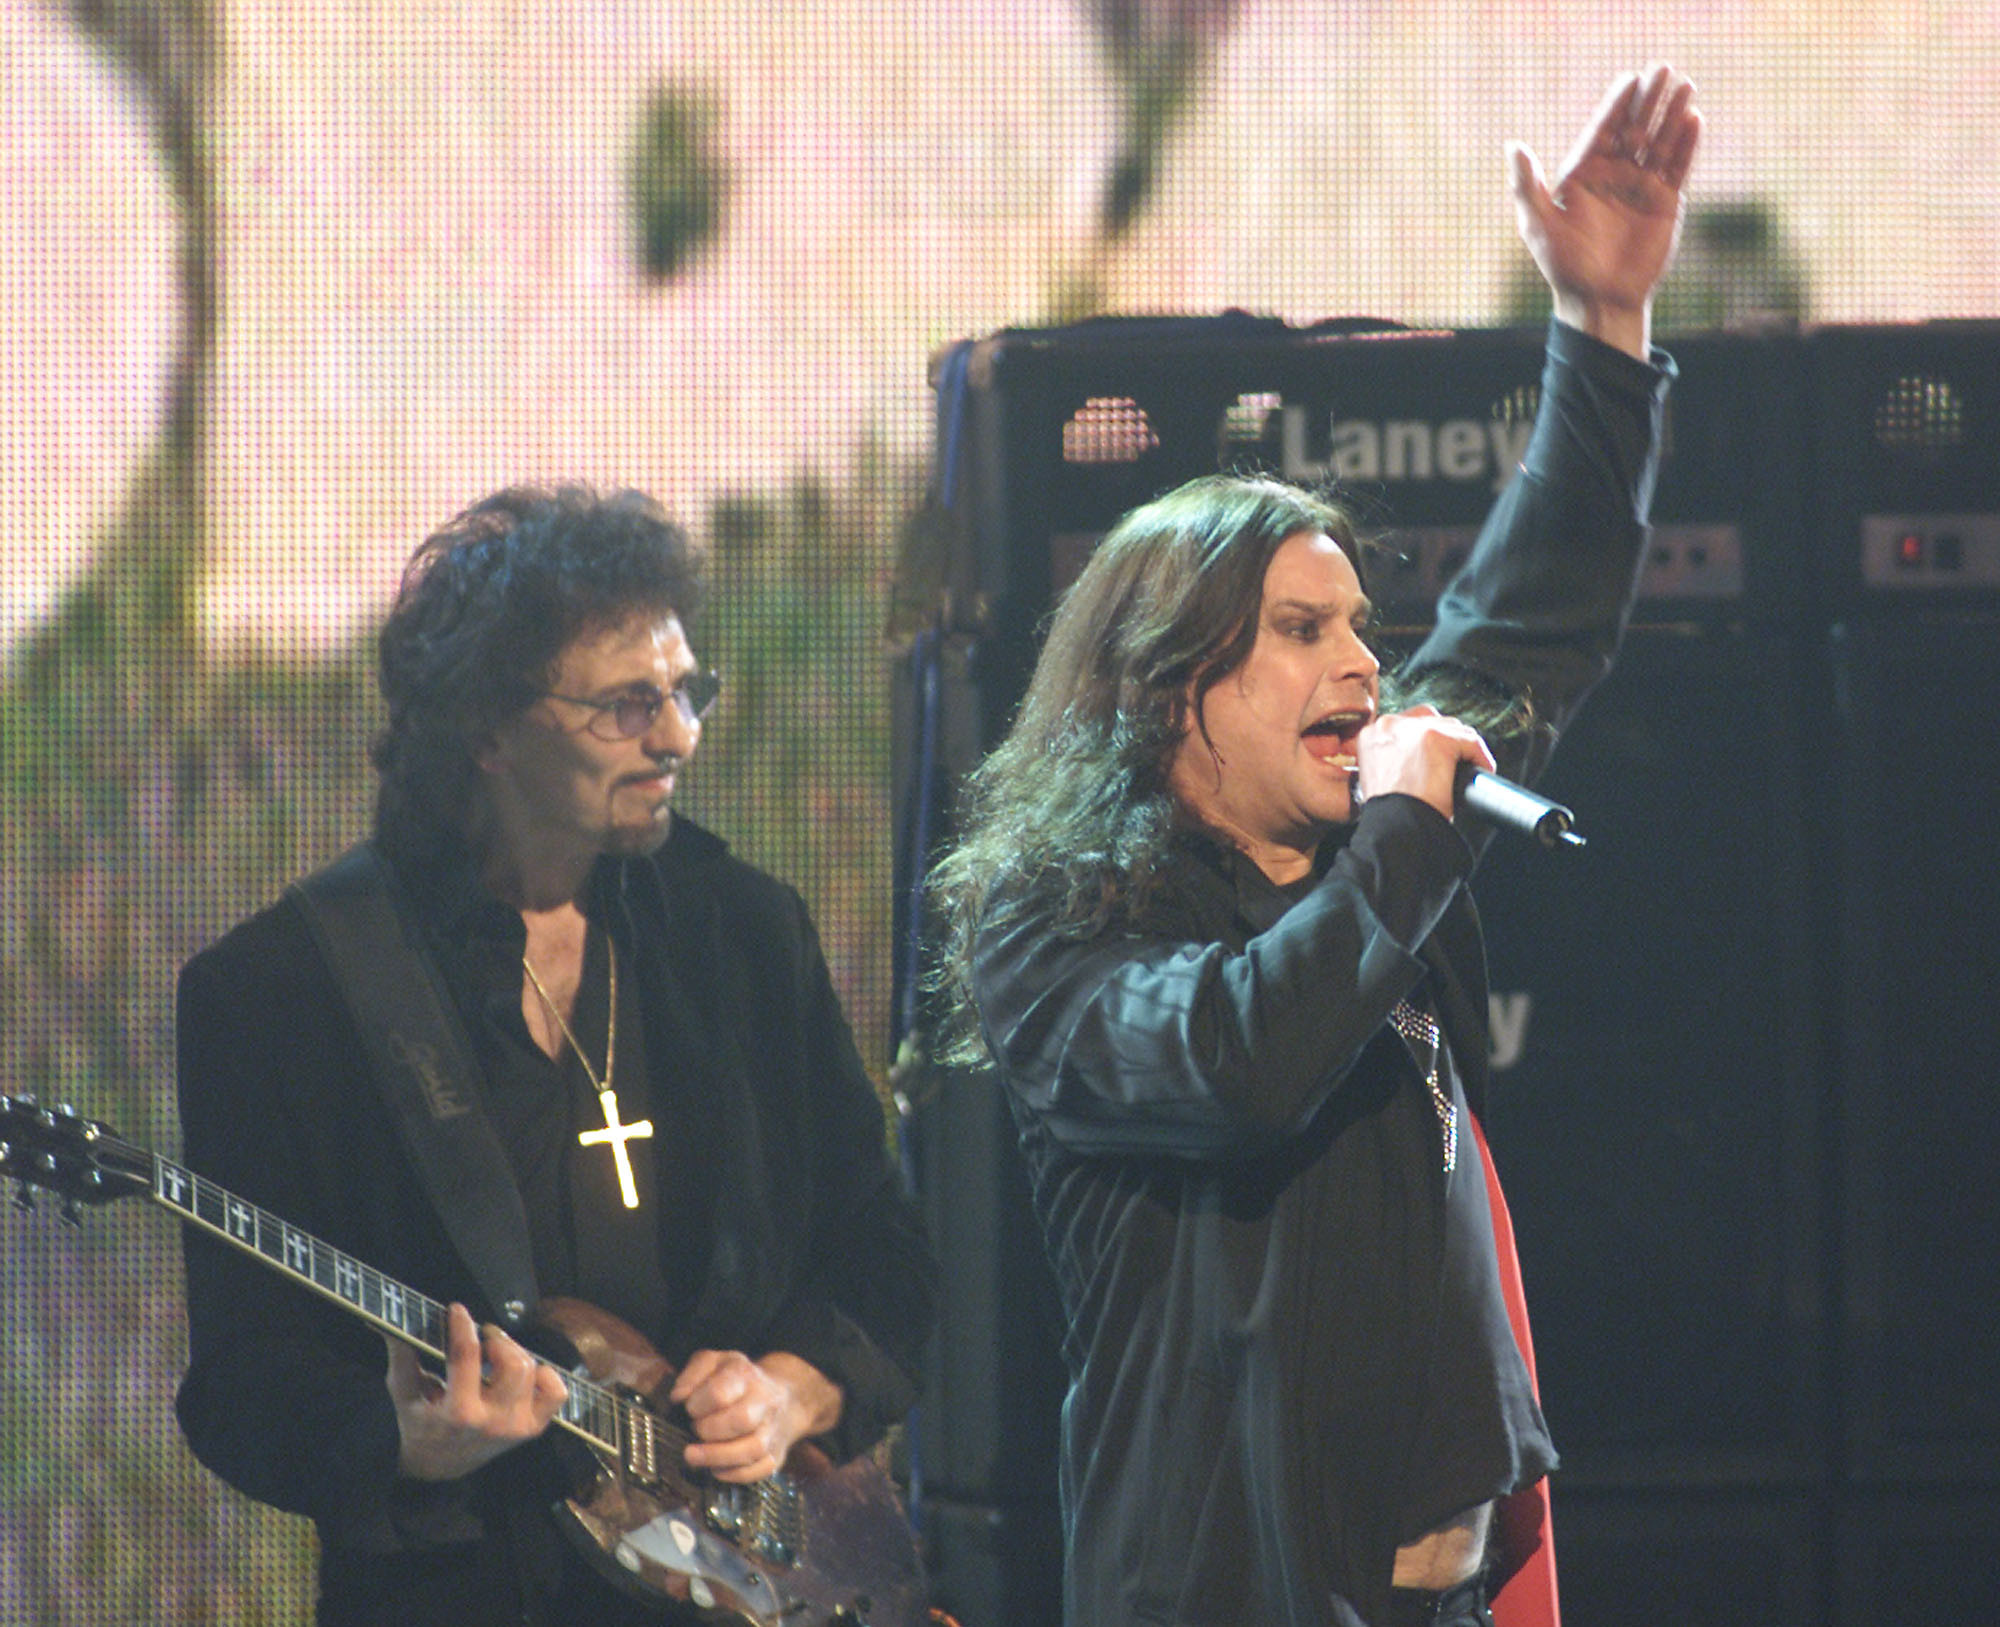 Black Sabbath are part of Birmingham's iconic music scene ©Getty Images